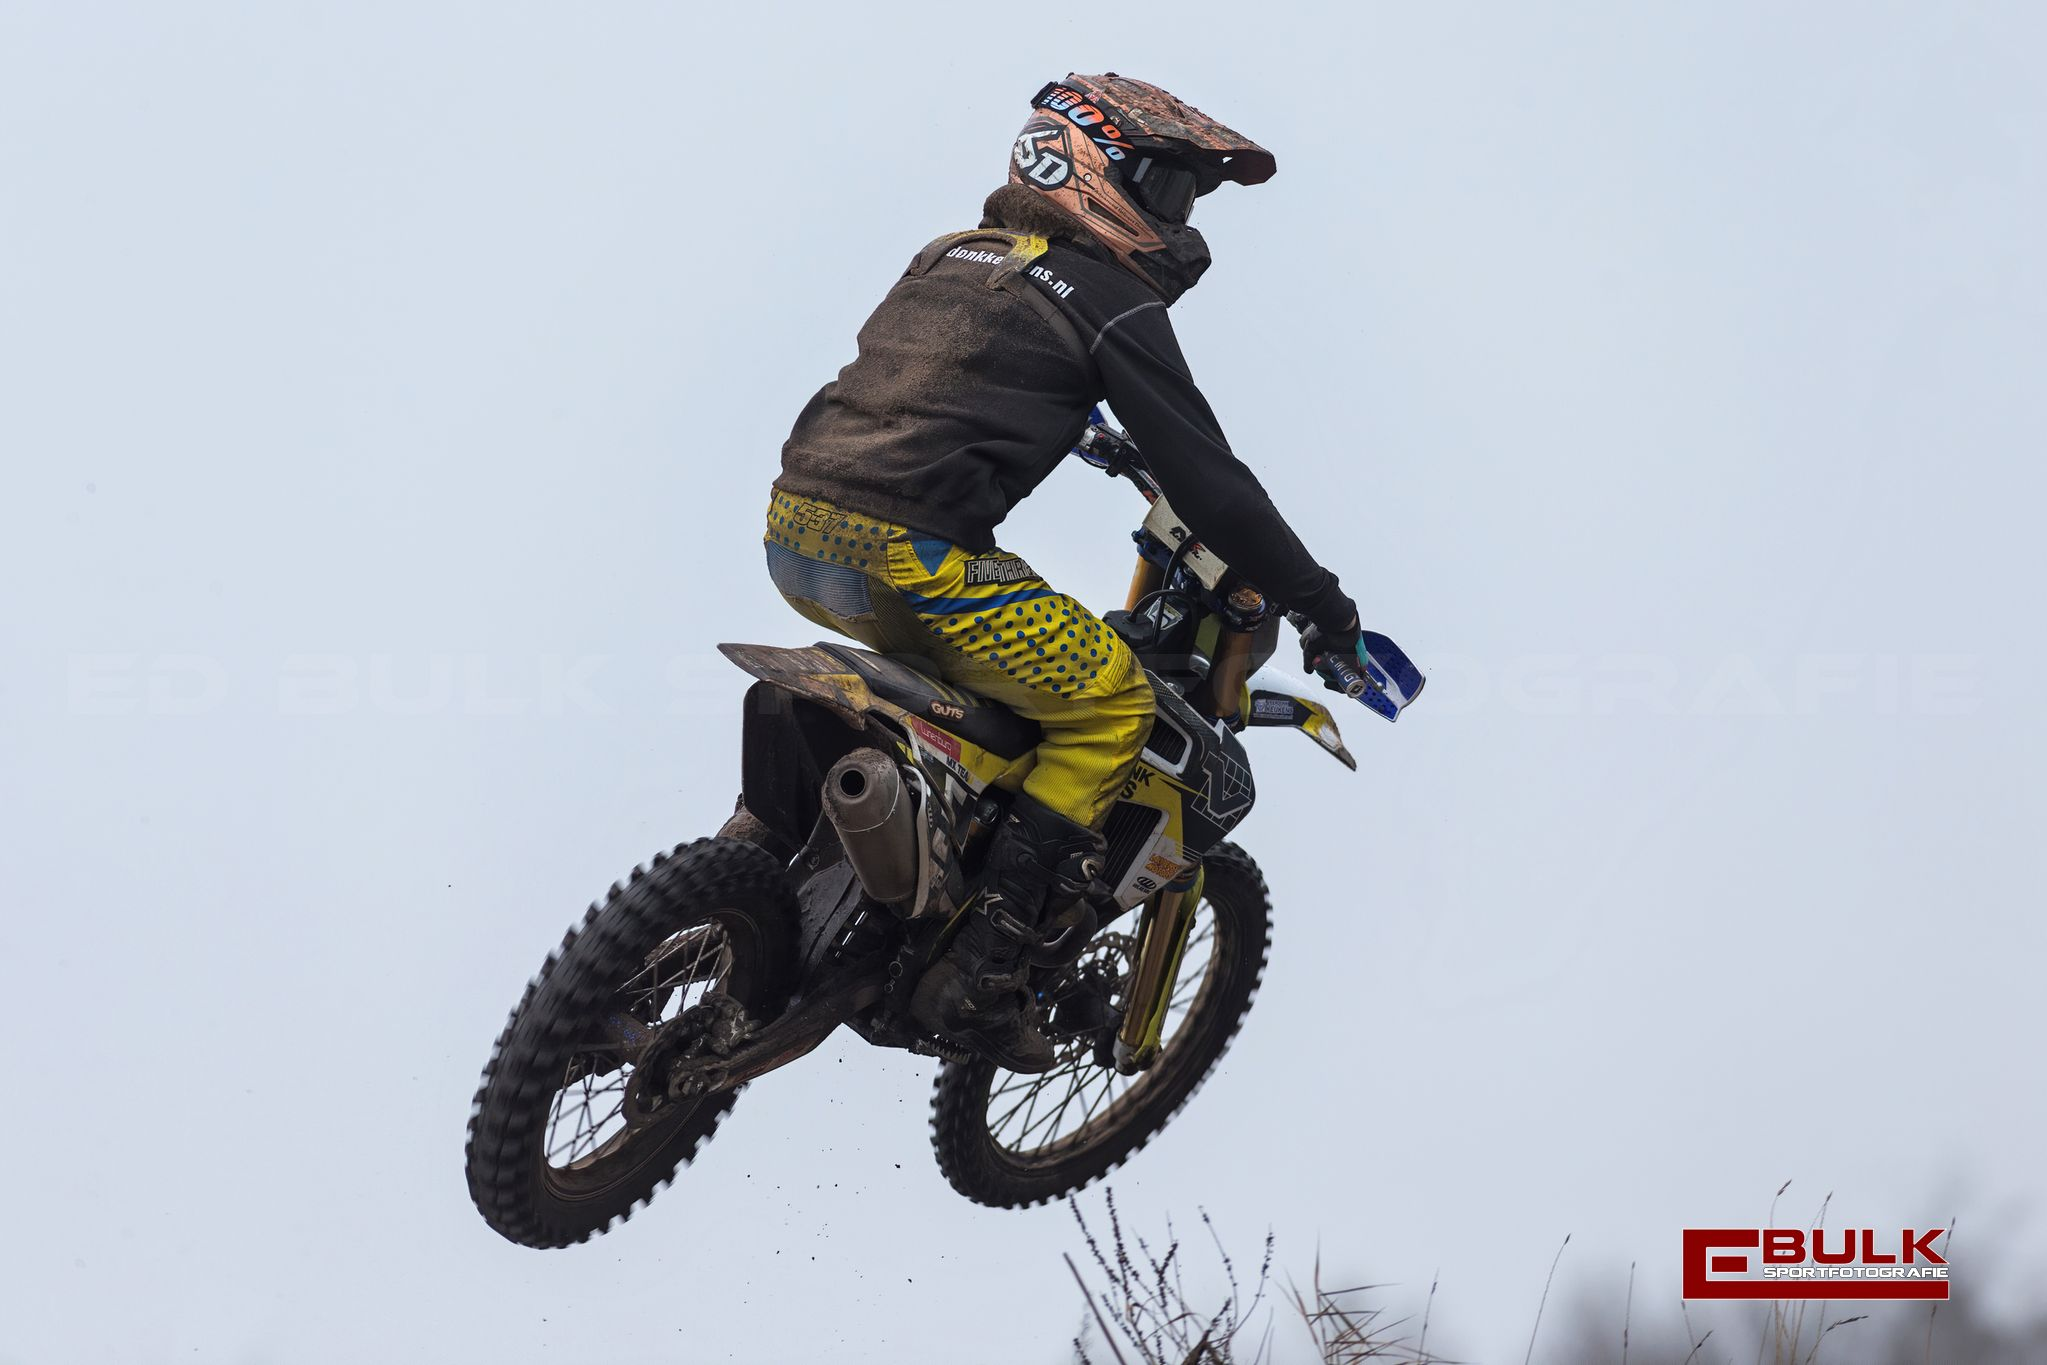 eebs1646-de-ed_bulk_sportfotografie